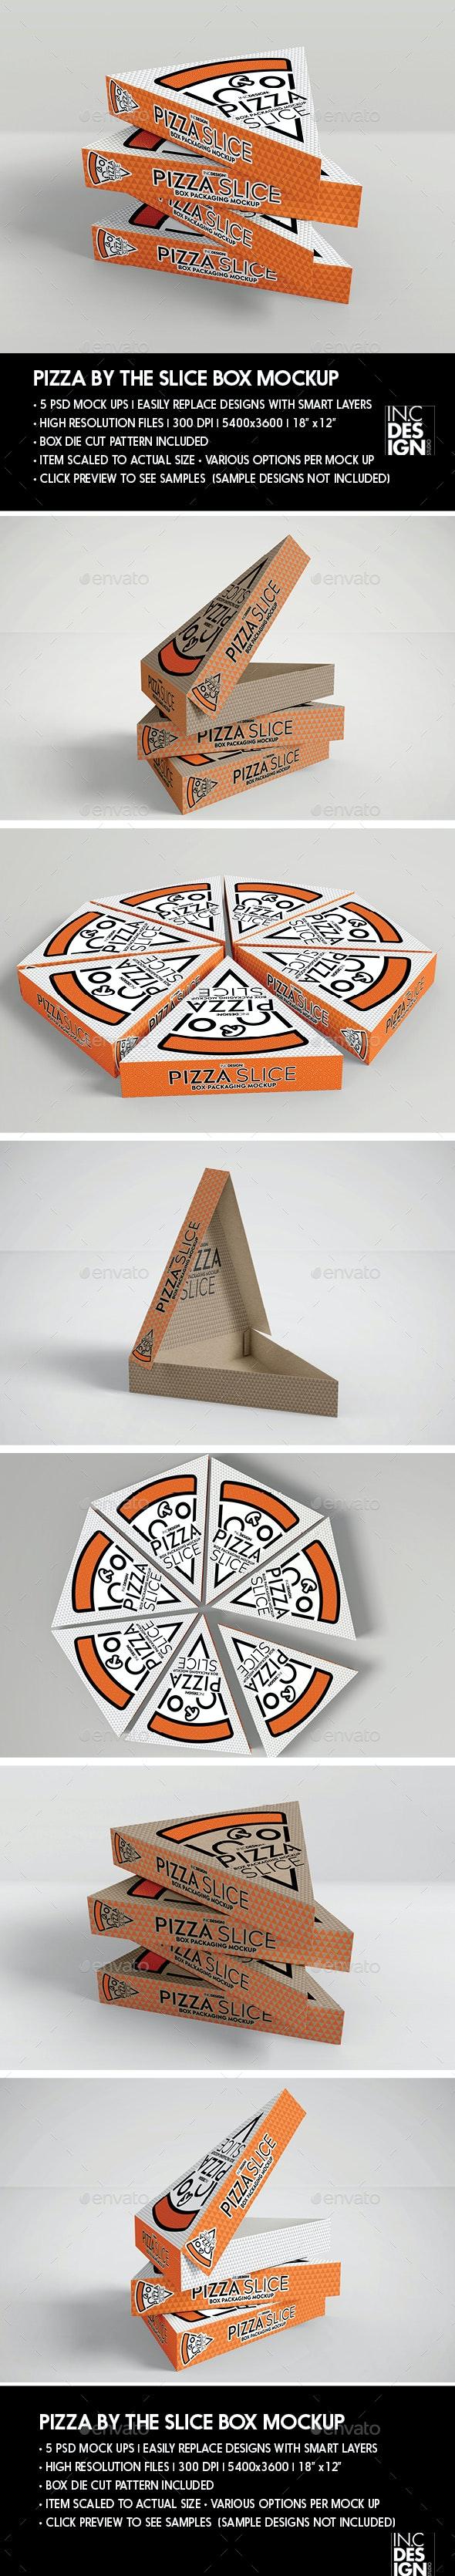 Packaging Mockup Pizza Slice Box - Product Mock-Ups Graphics